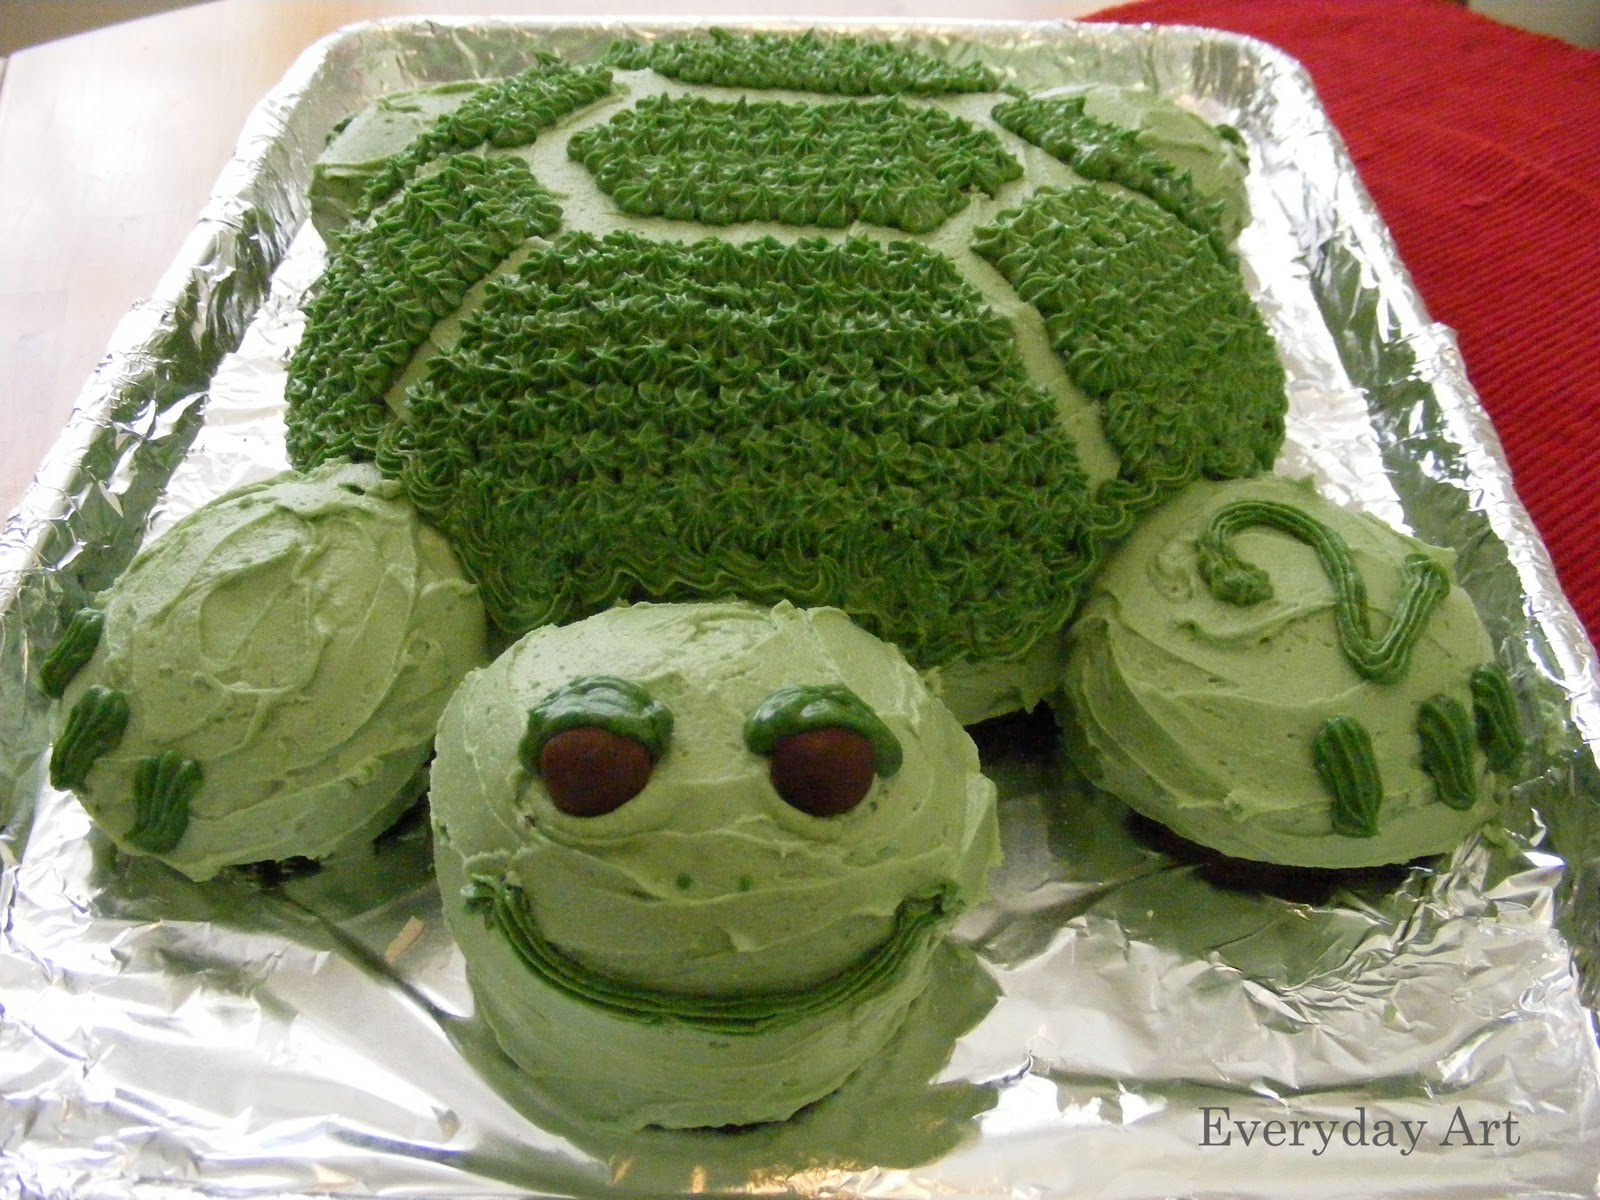 Everyday Art Turtle Birthday Cake